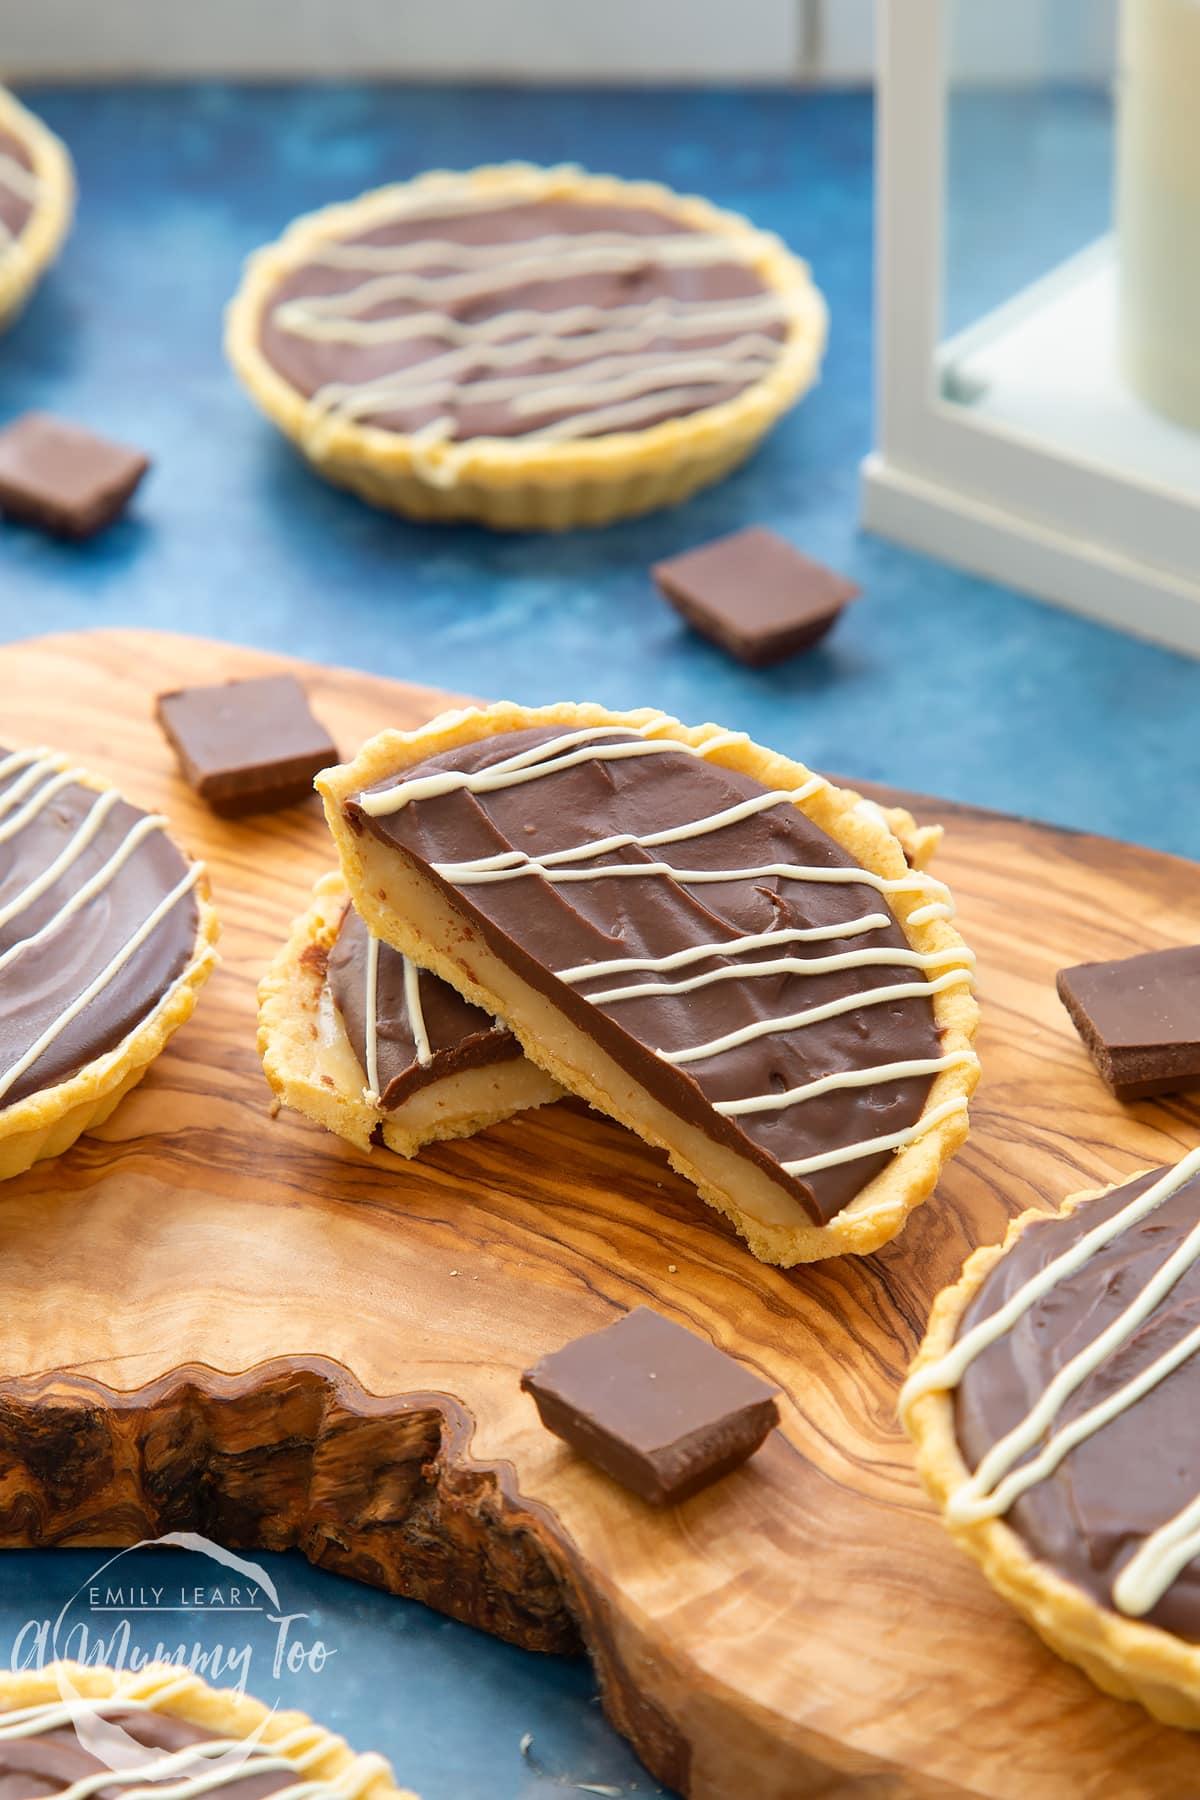 Mini chocolate tarts on an olive board. The tart in focus has been cut in half.